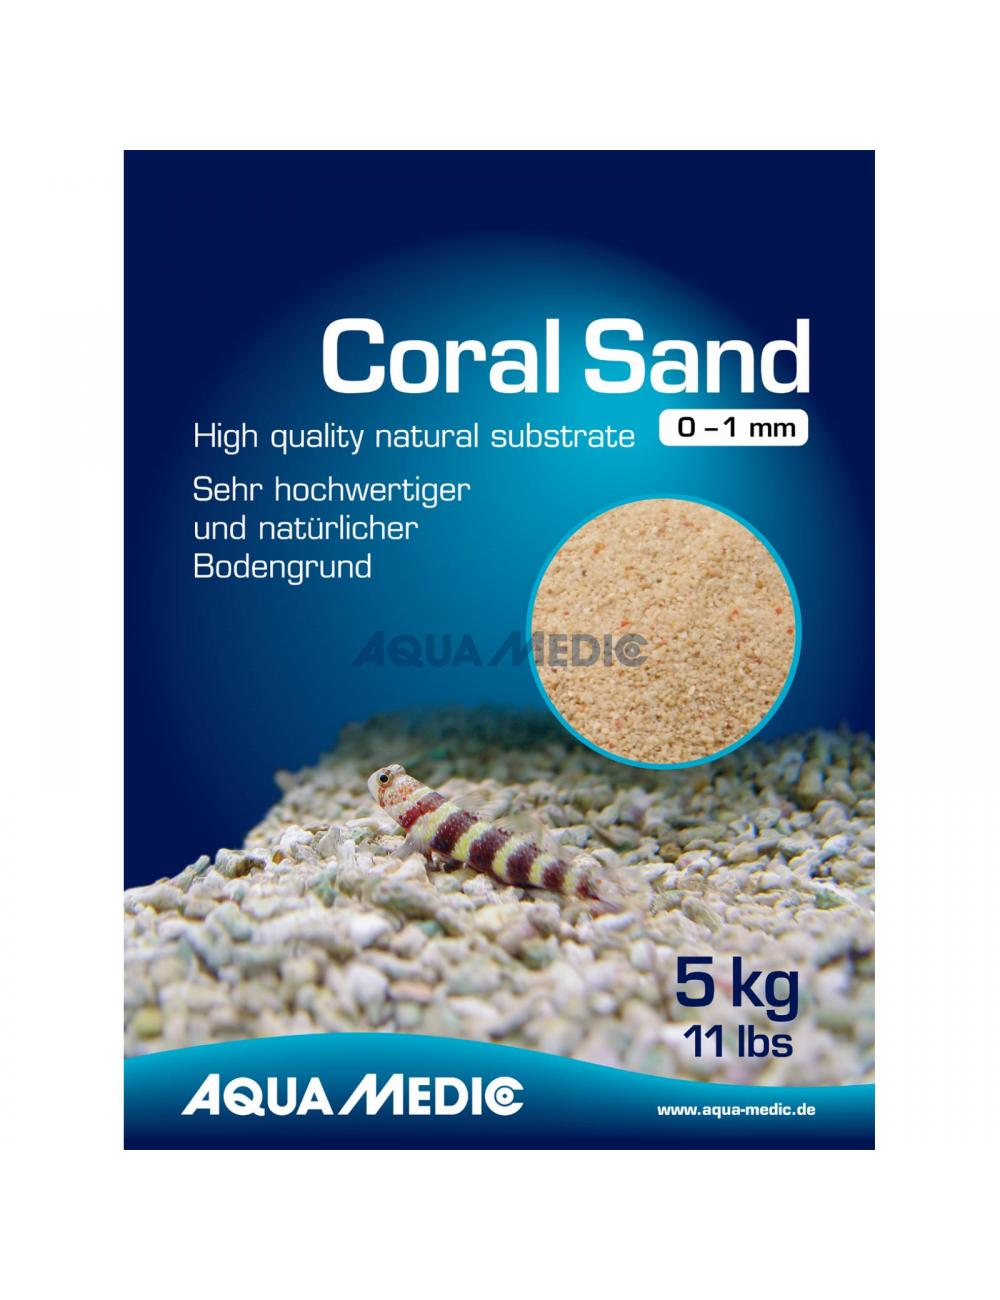 AQUA-MEDIC - Coral Sand - 0 - 1 mm - 5 kg sac